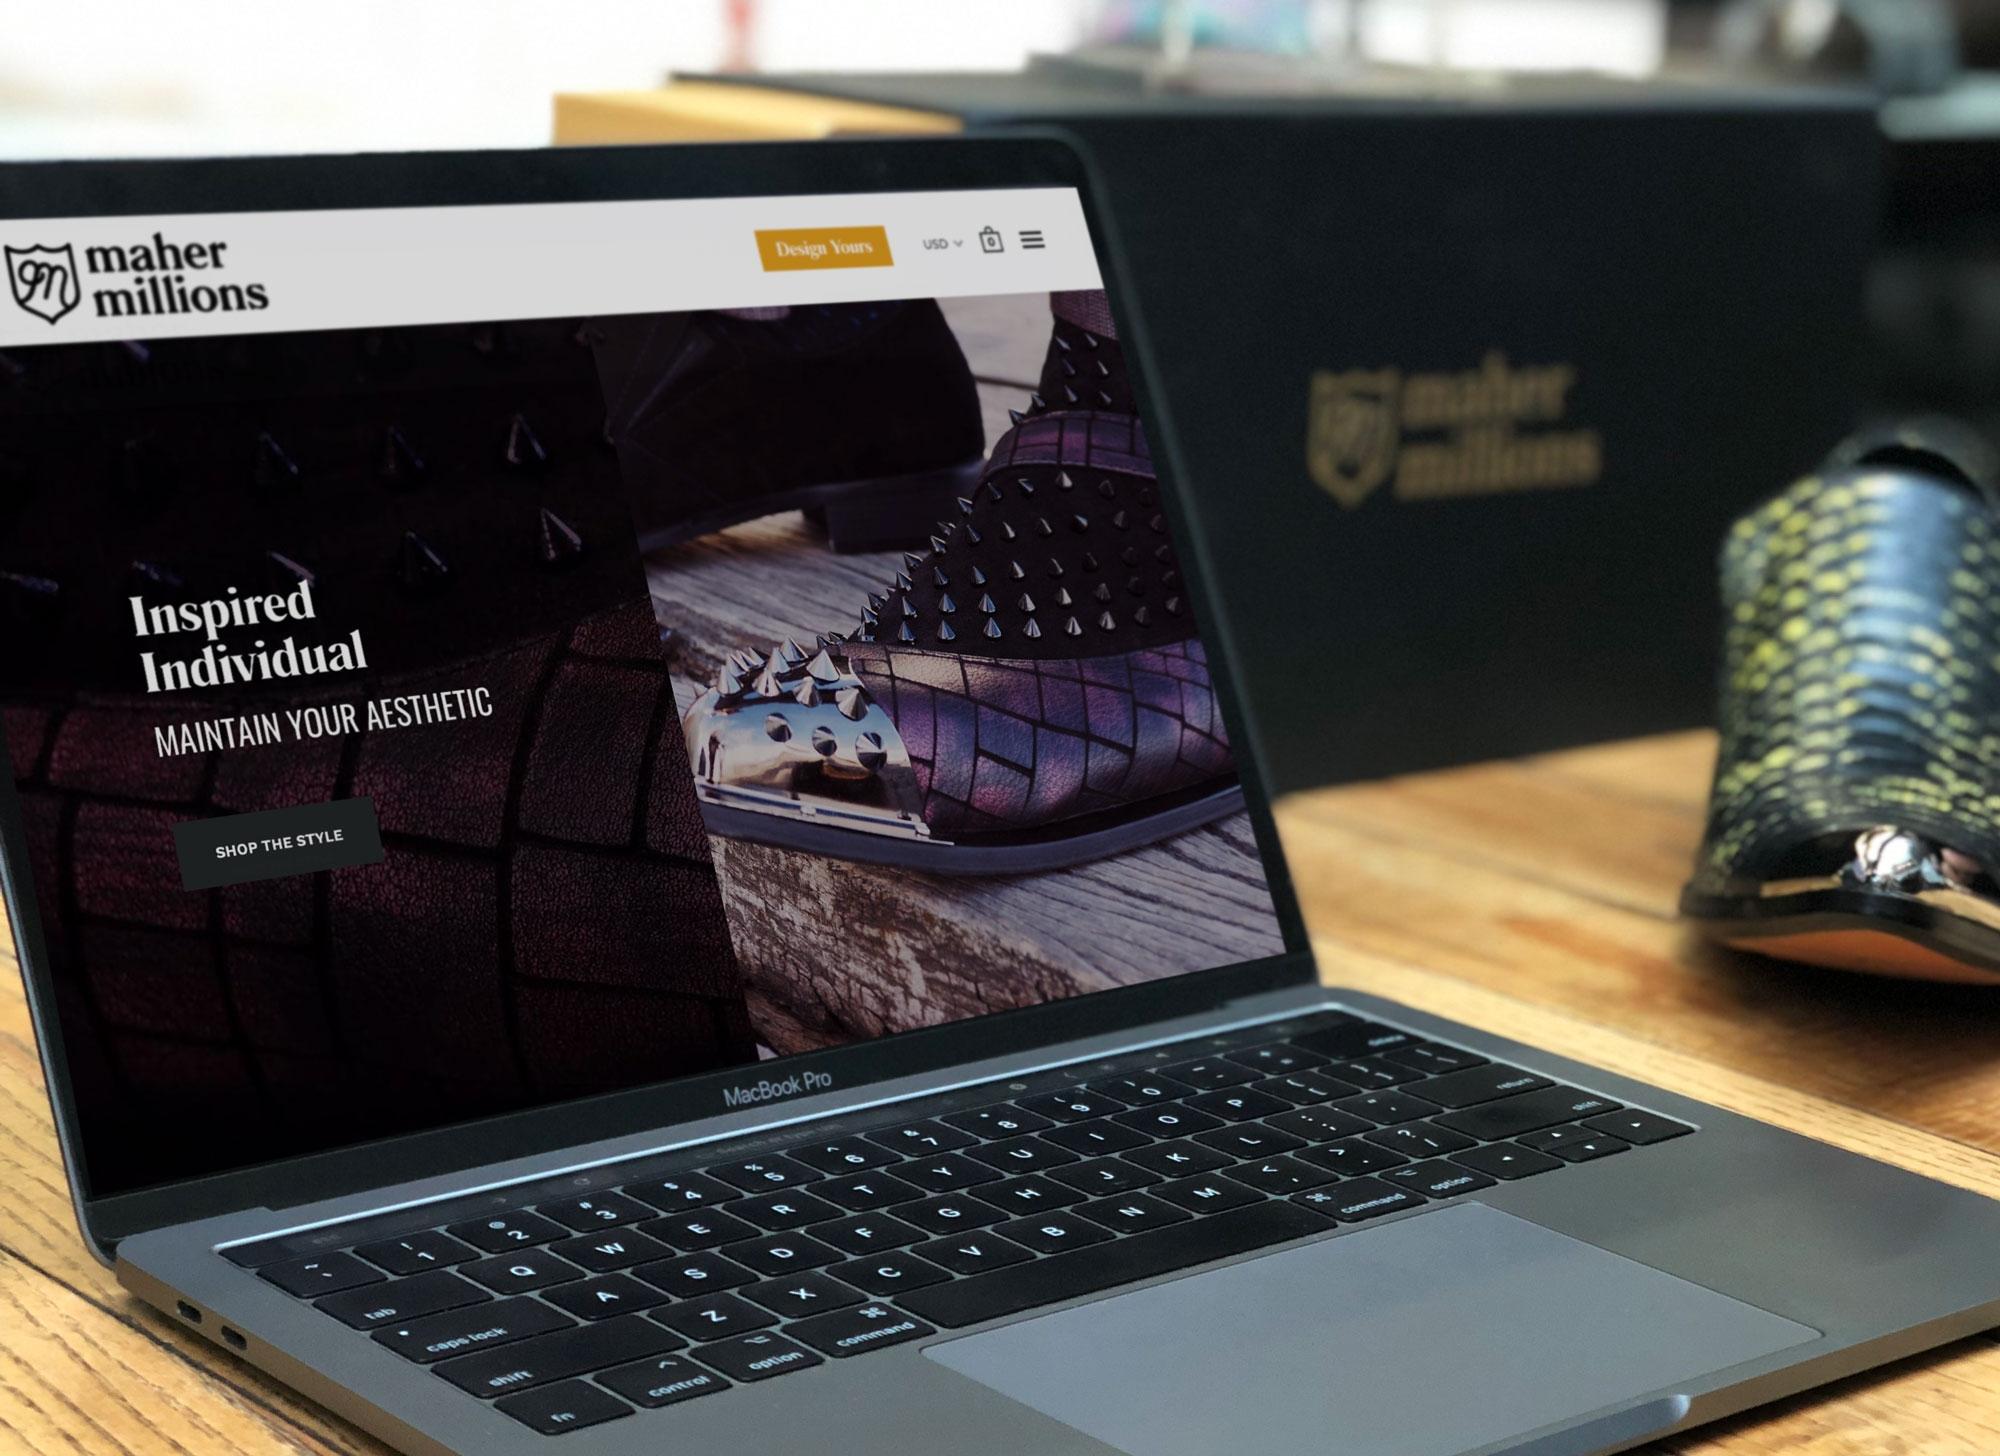 Maher Millions - Website